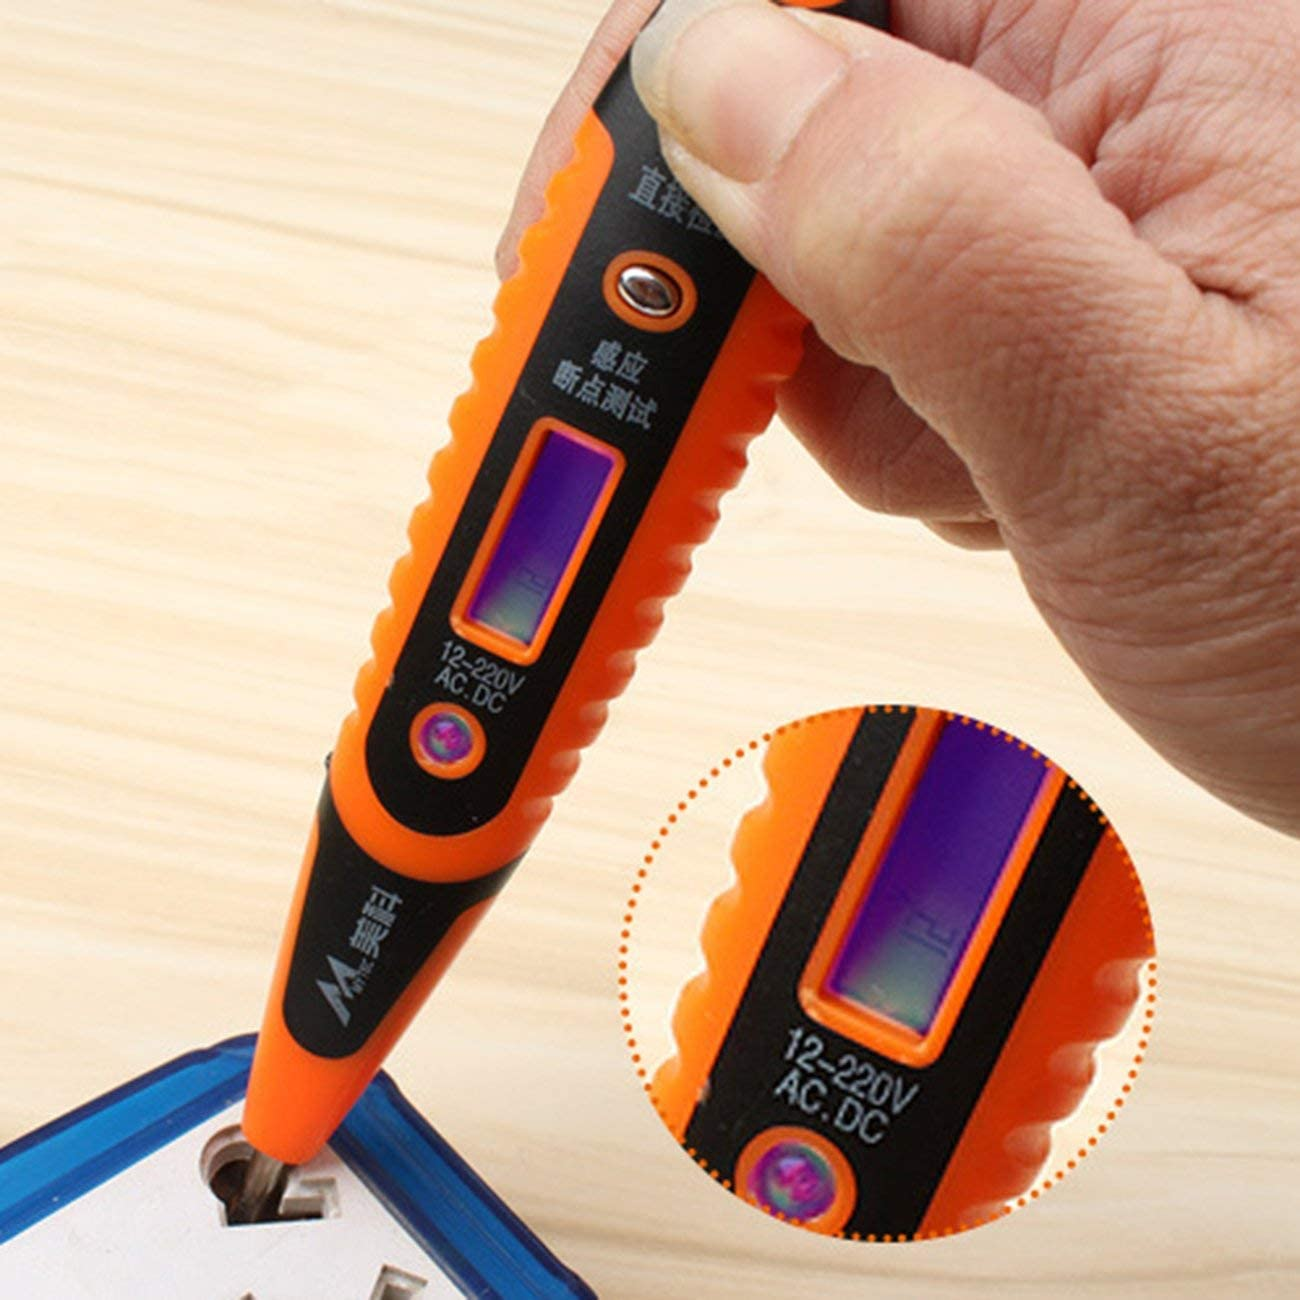 Elviray Digital Test Matita Multifunzione AC DC 12-250 V Tester Elettrico Display LCD Voltage Test Pen per Elettricista